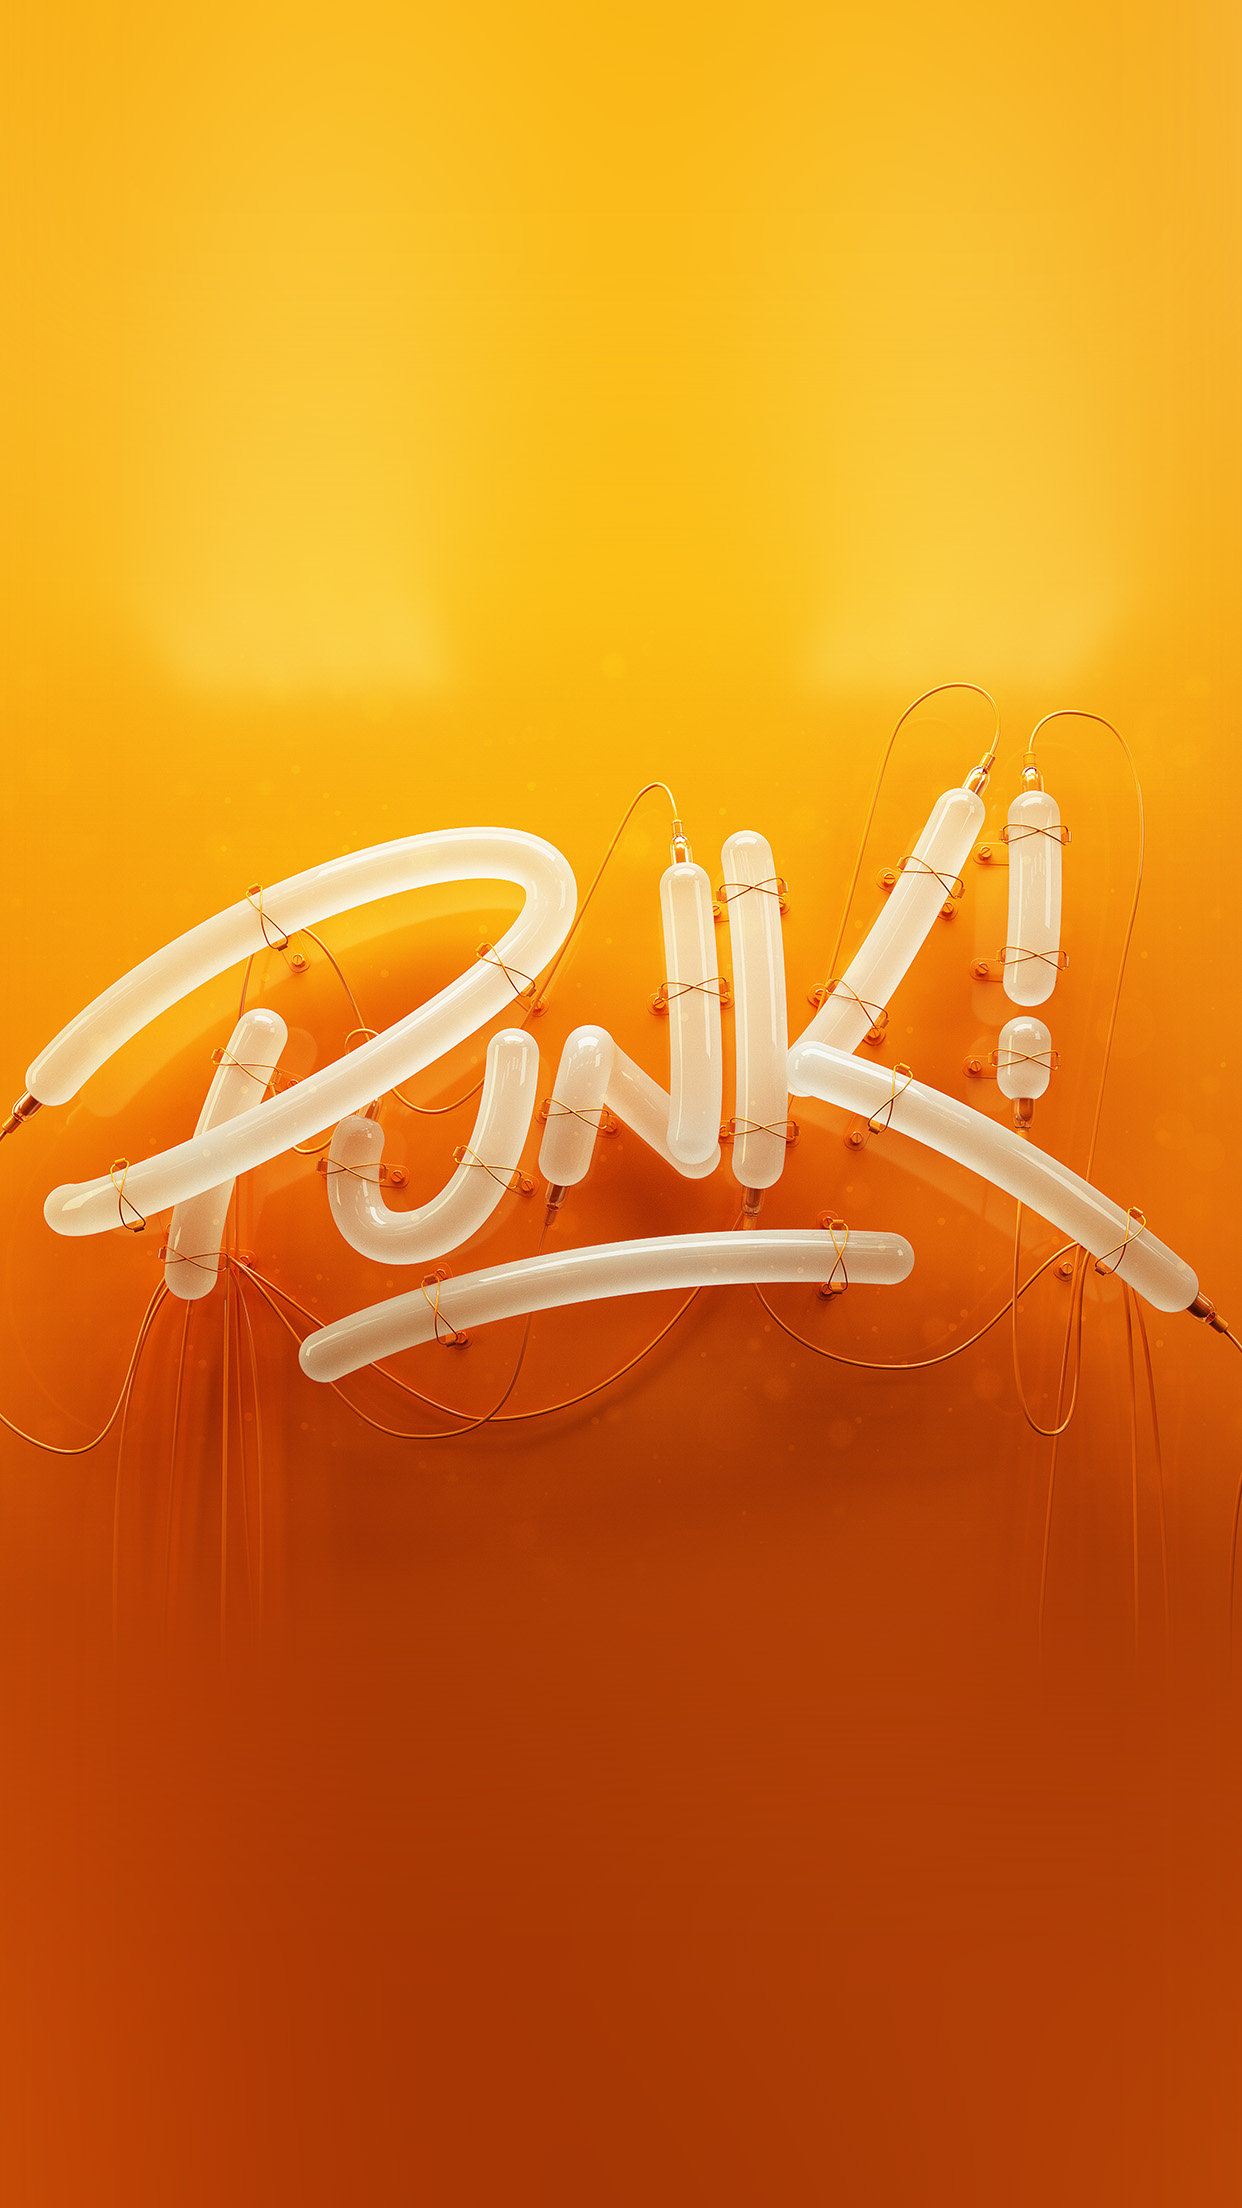 iPhone7papers com   iPhone7 wallpaper   ay76-punk-neon-sign-art